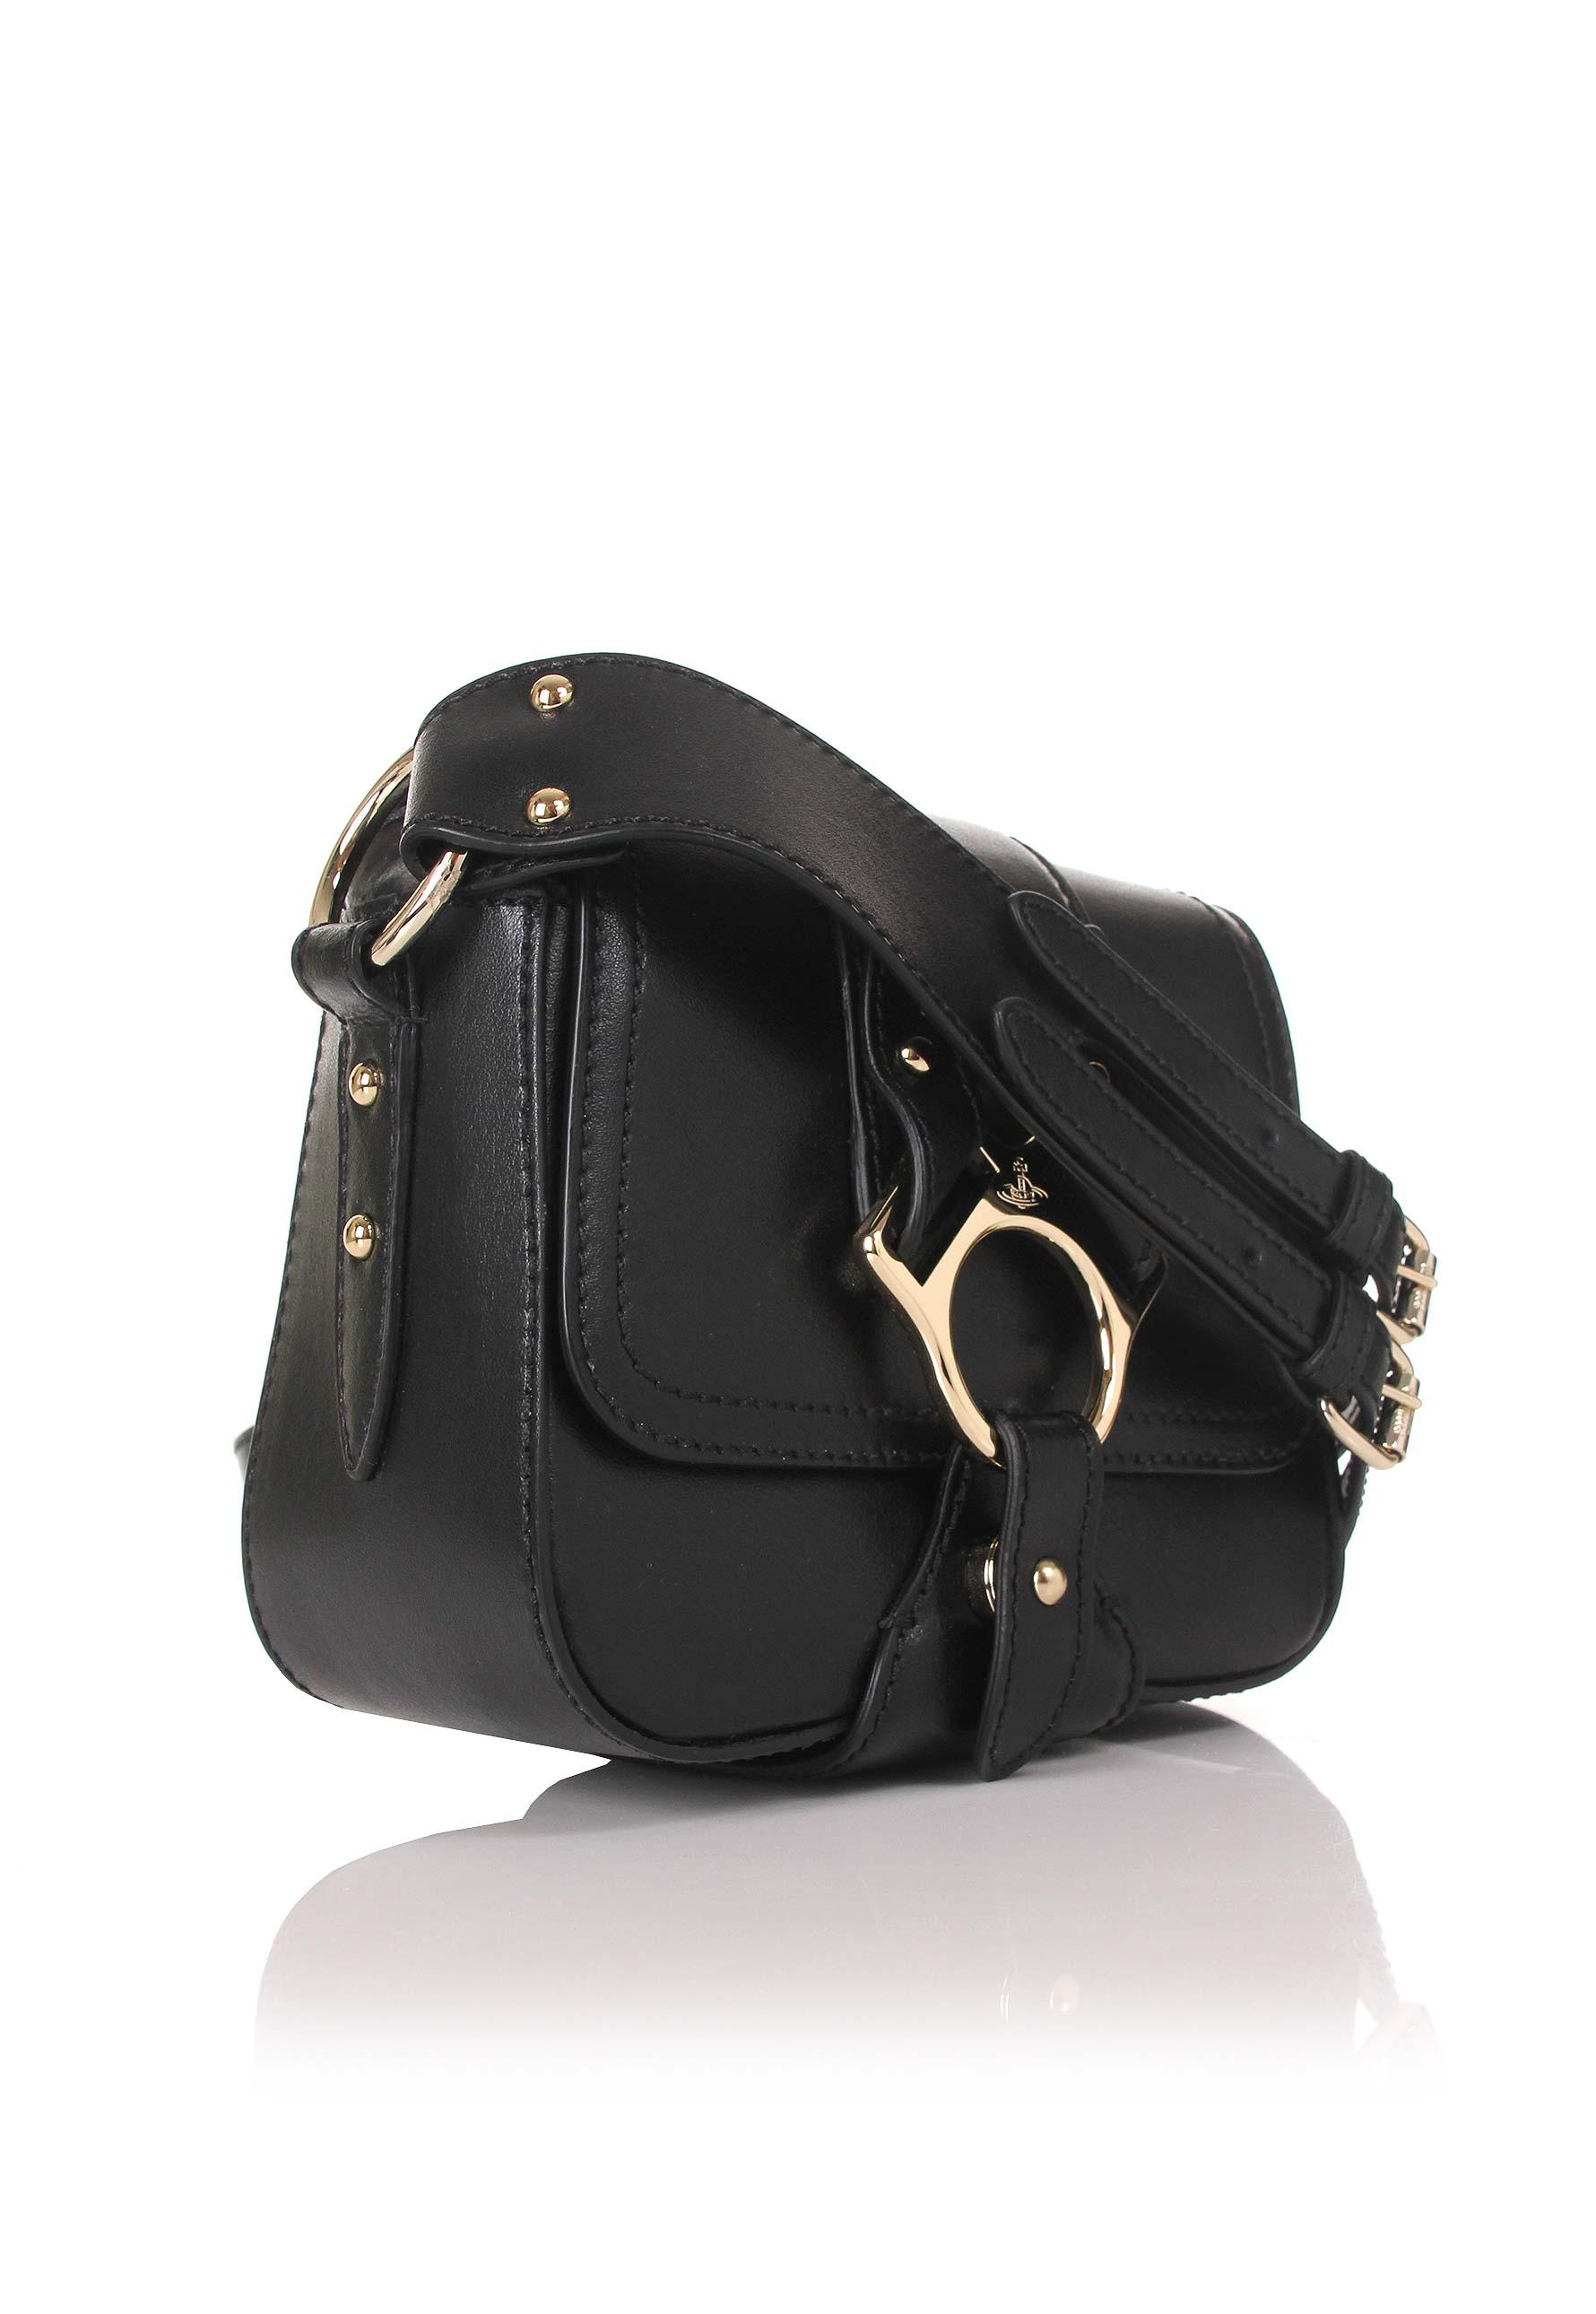 61ea012e66 Vivienne Westwood - Folly 43030021 Small Saddle Bag Black - Lyst